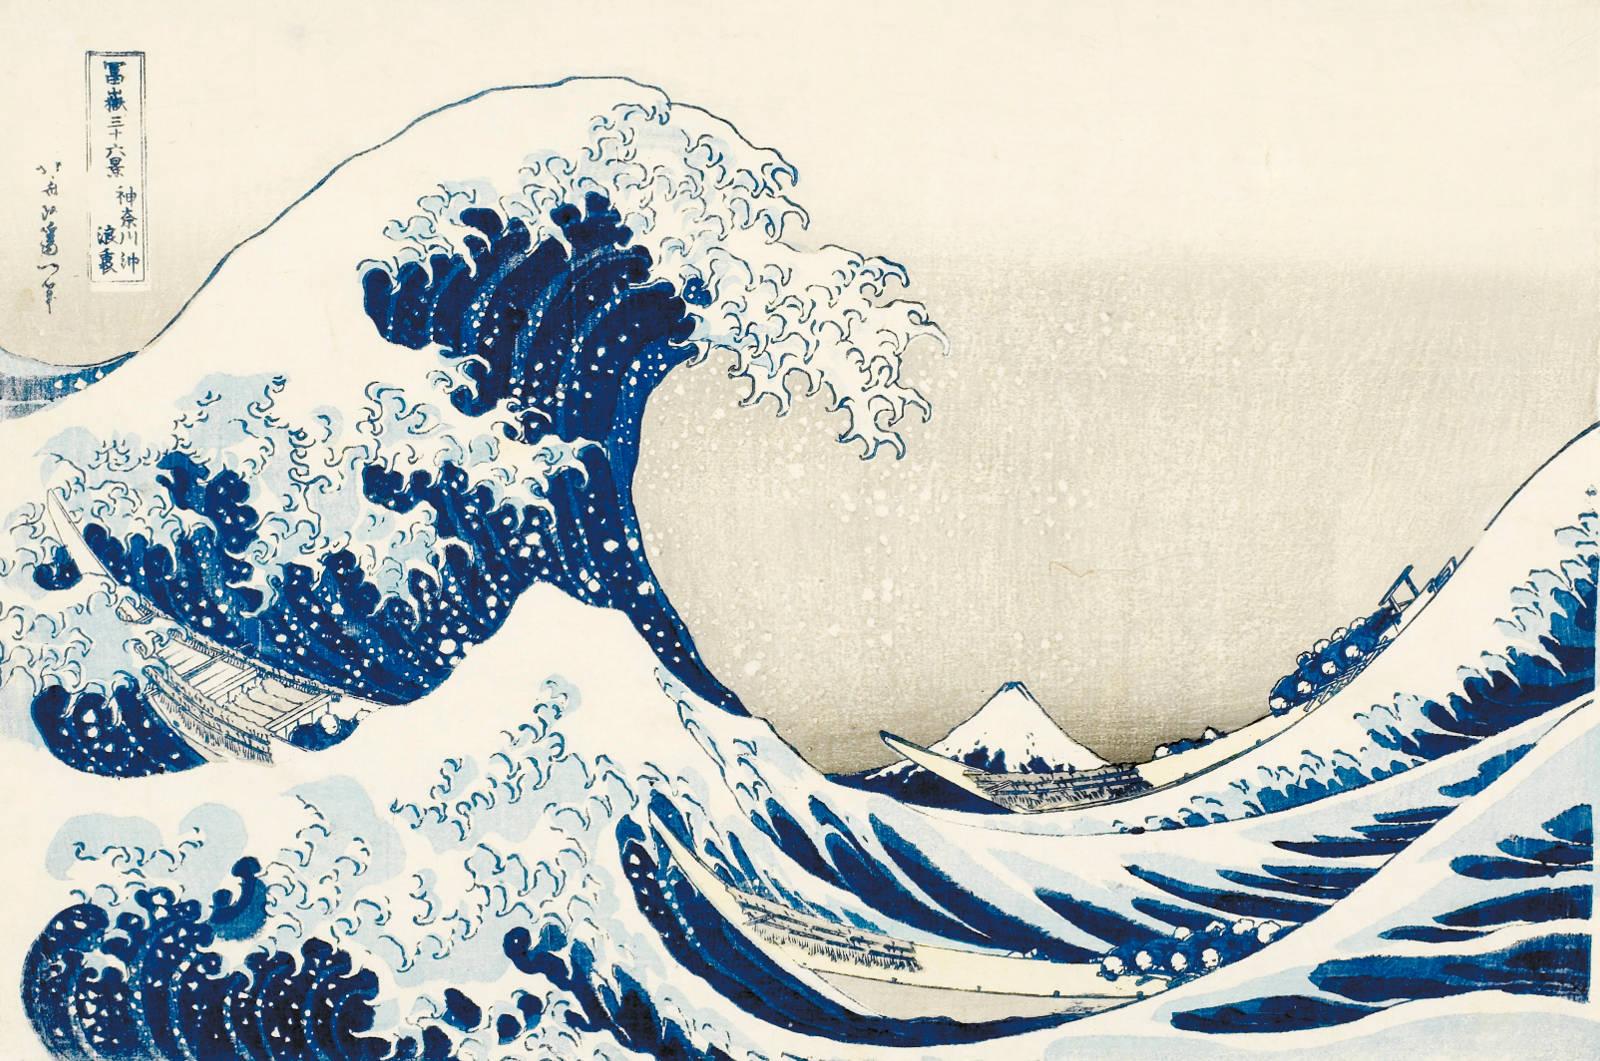 """The Great Wave off Kanagawa"" by Katsushika Hokusai."